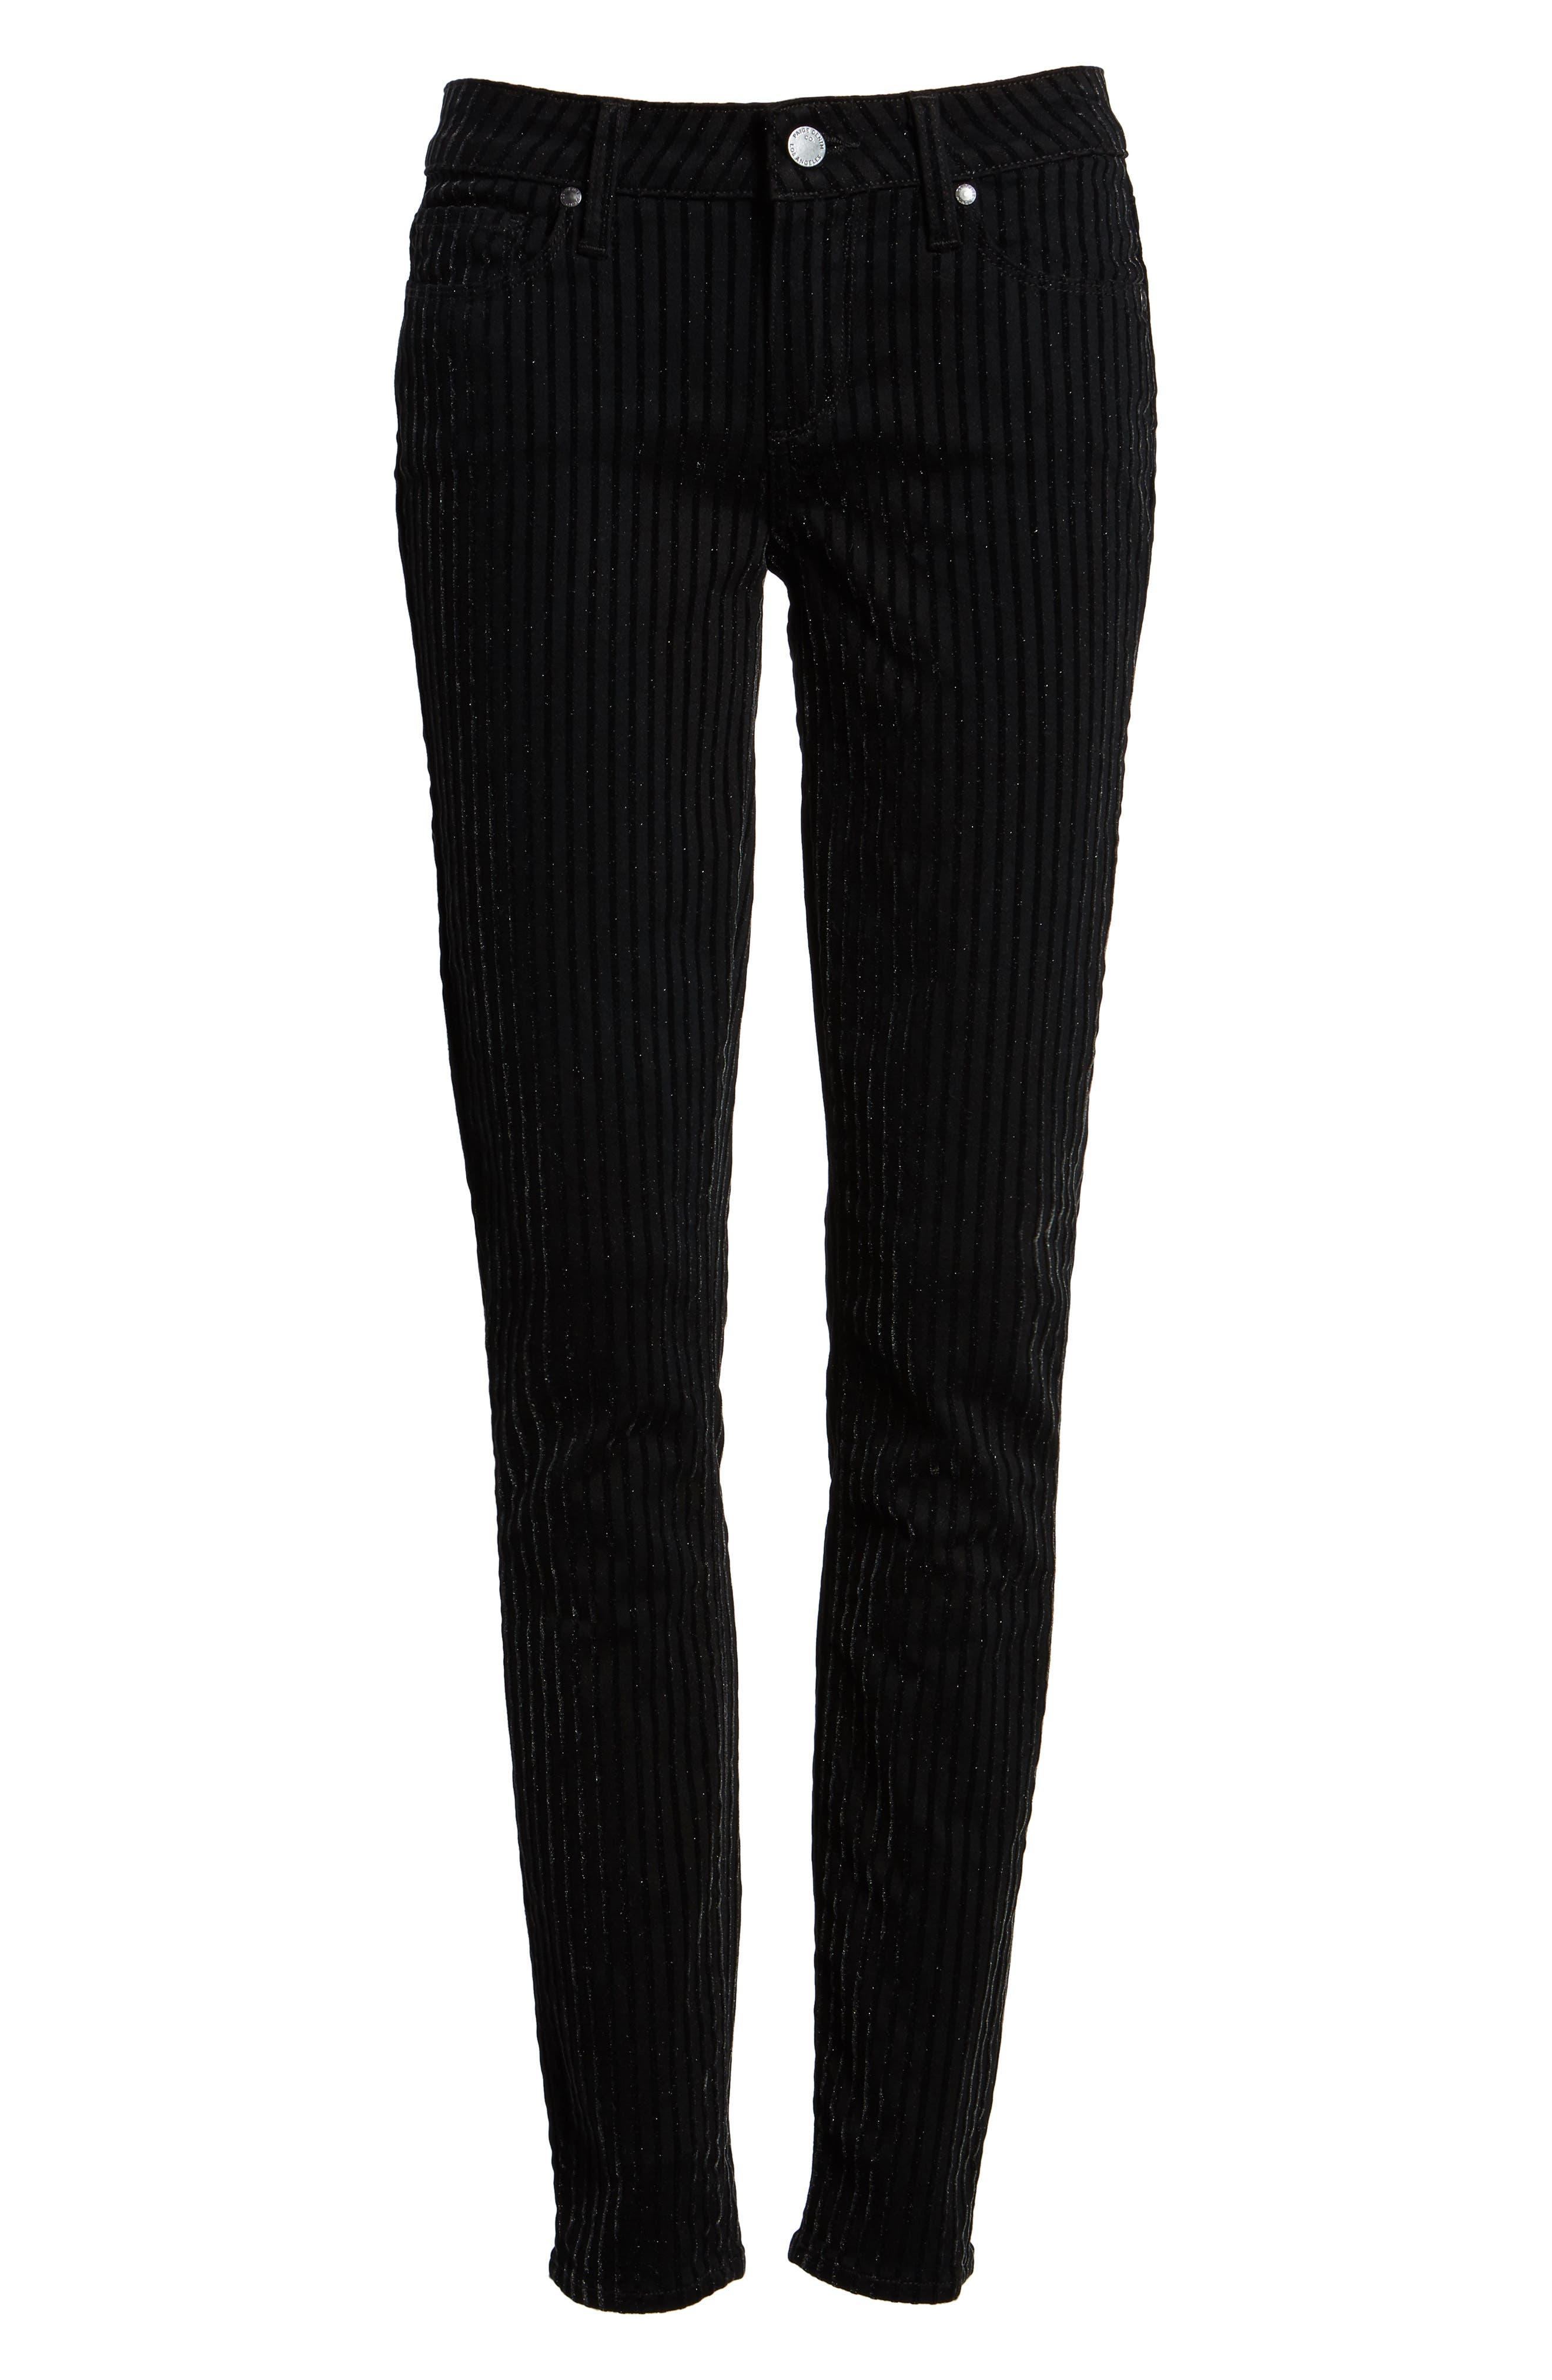 Verdugo Ultra Skinny Jeans,                             Alternate thumbnail 6, color,